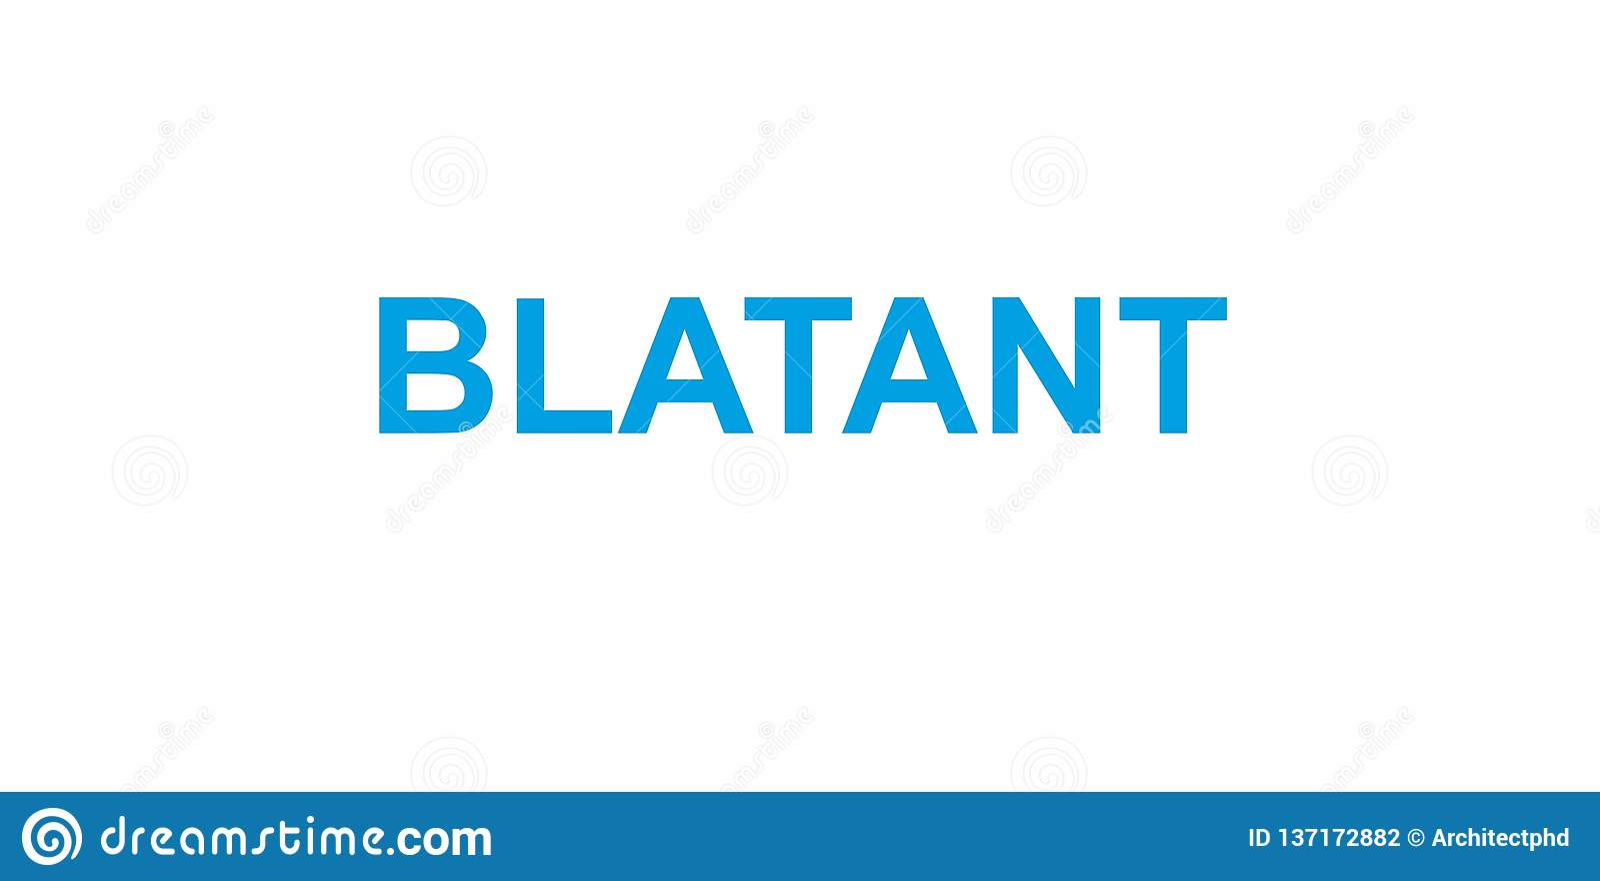 American slang for prints